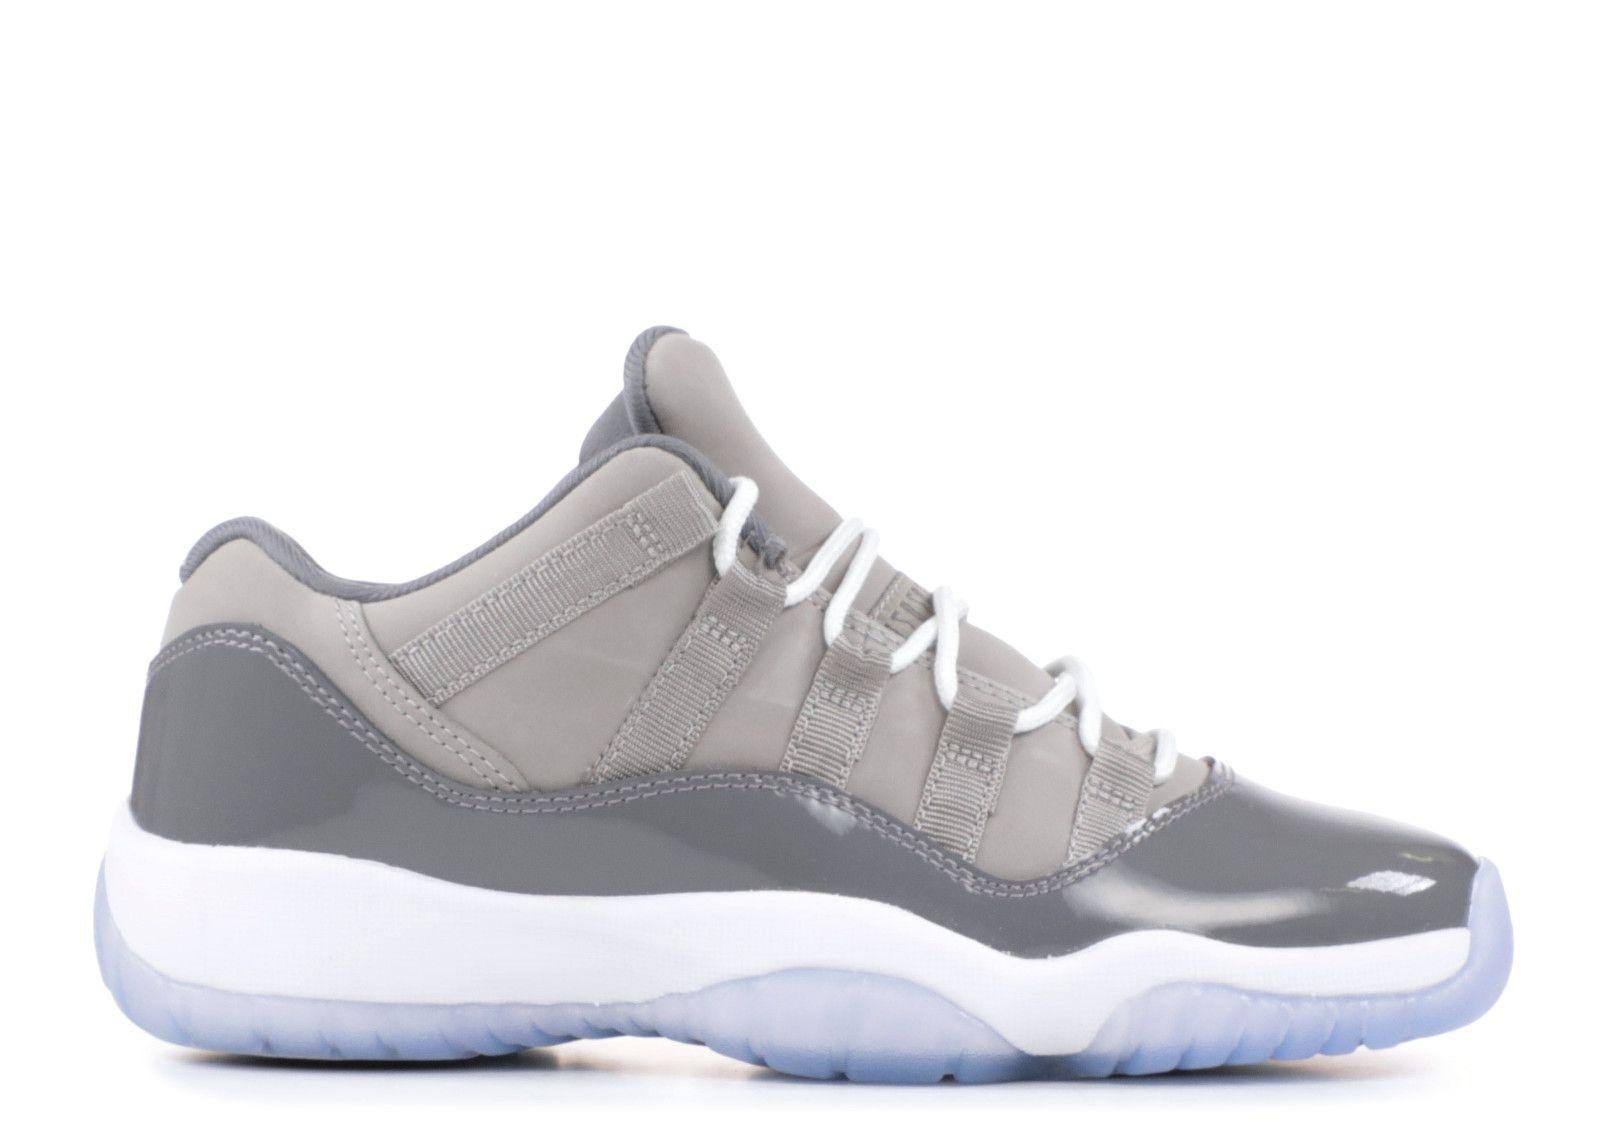 Air Jordan 11 Retro Low Bg Cool Grey Air Jordan 528896 003 Medium Grey White Gunsmoke In 2020 Jordan Shoes Girls Air Jordans White Nike Shoes